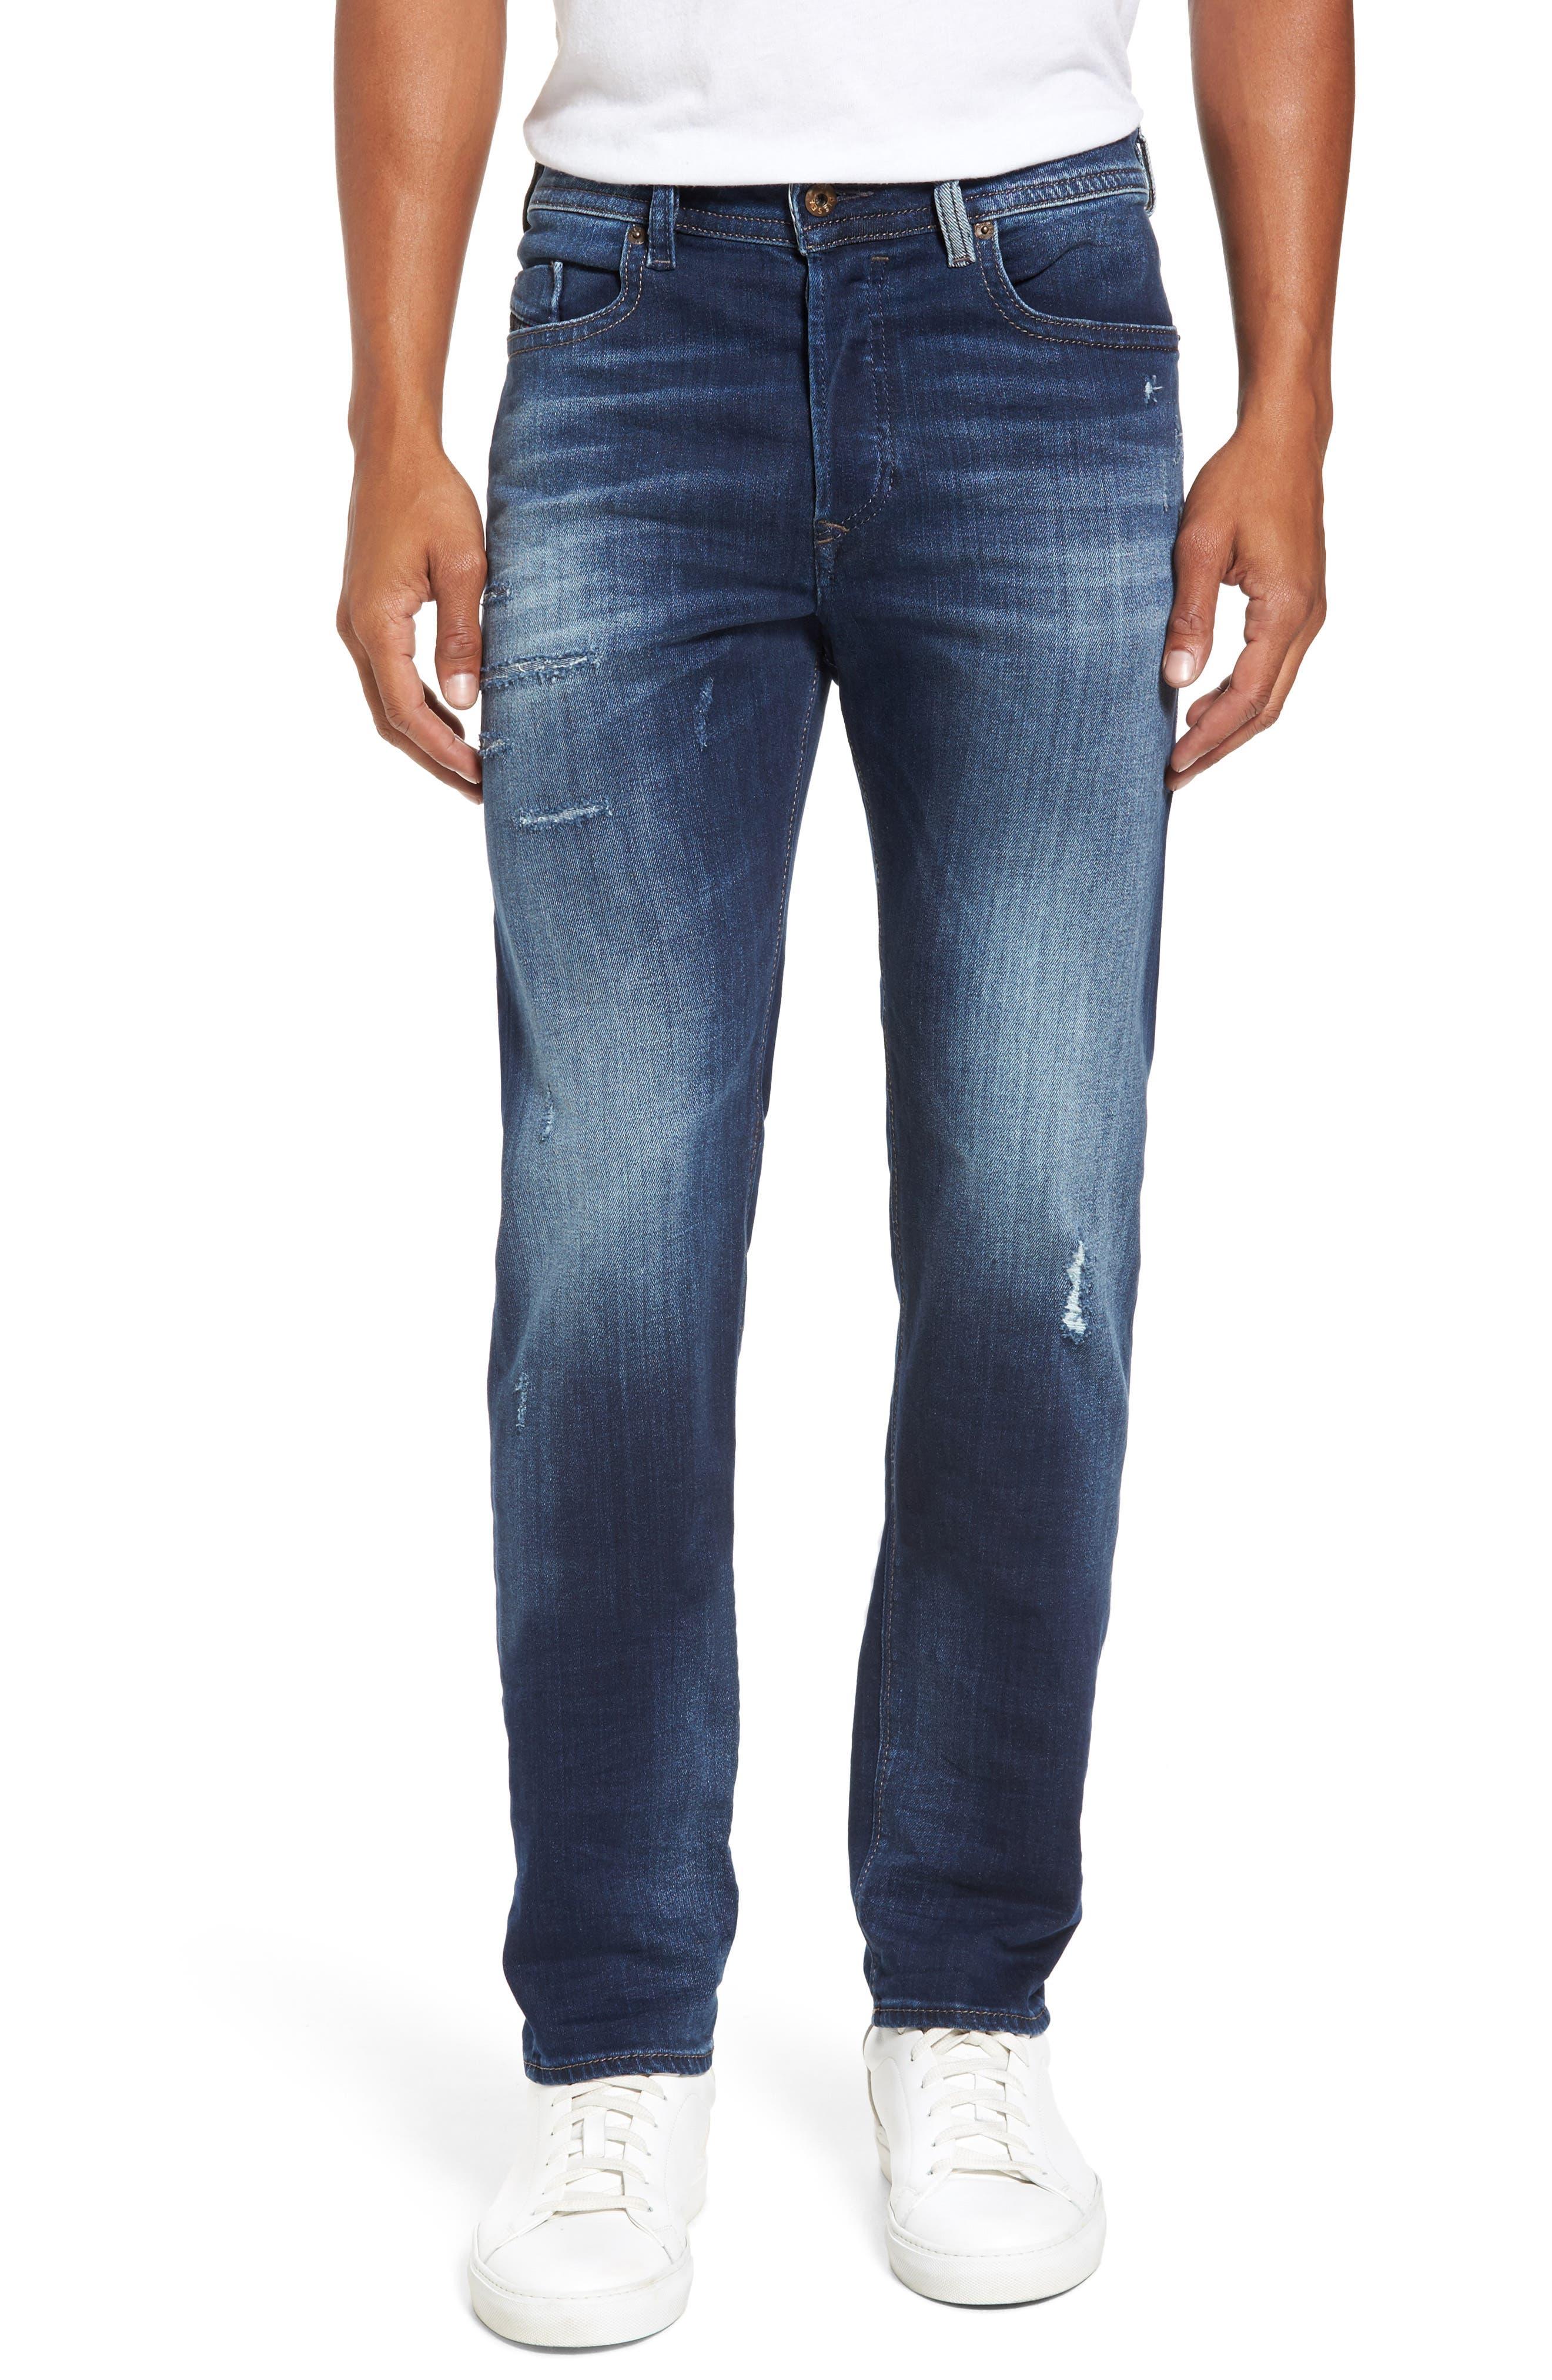 Buster Slim Straight Leg Jeans,                             Main thumbnail 1, color,                             900